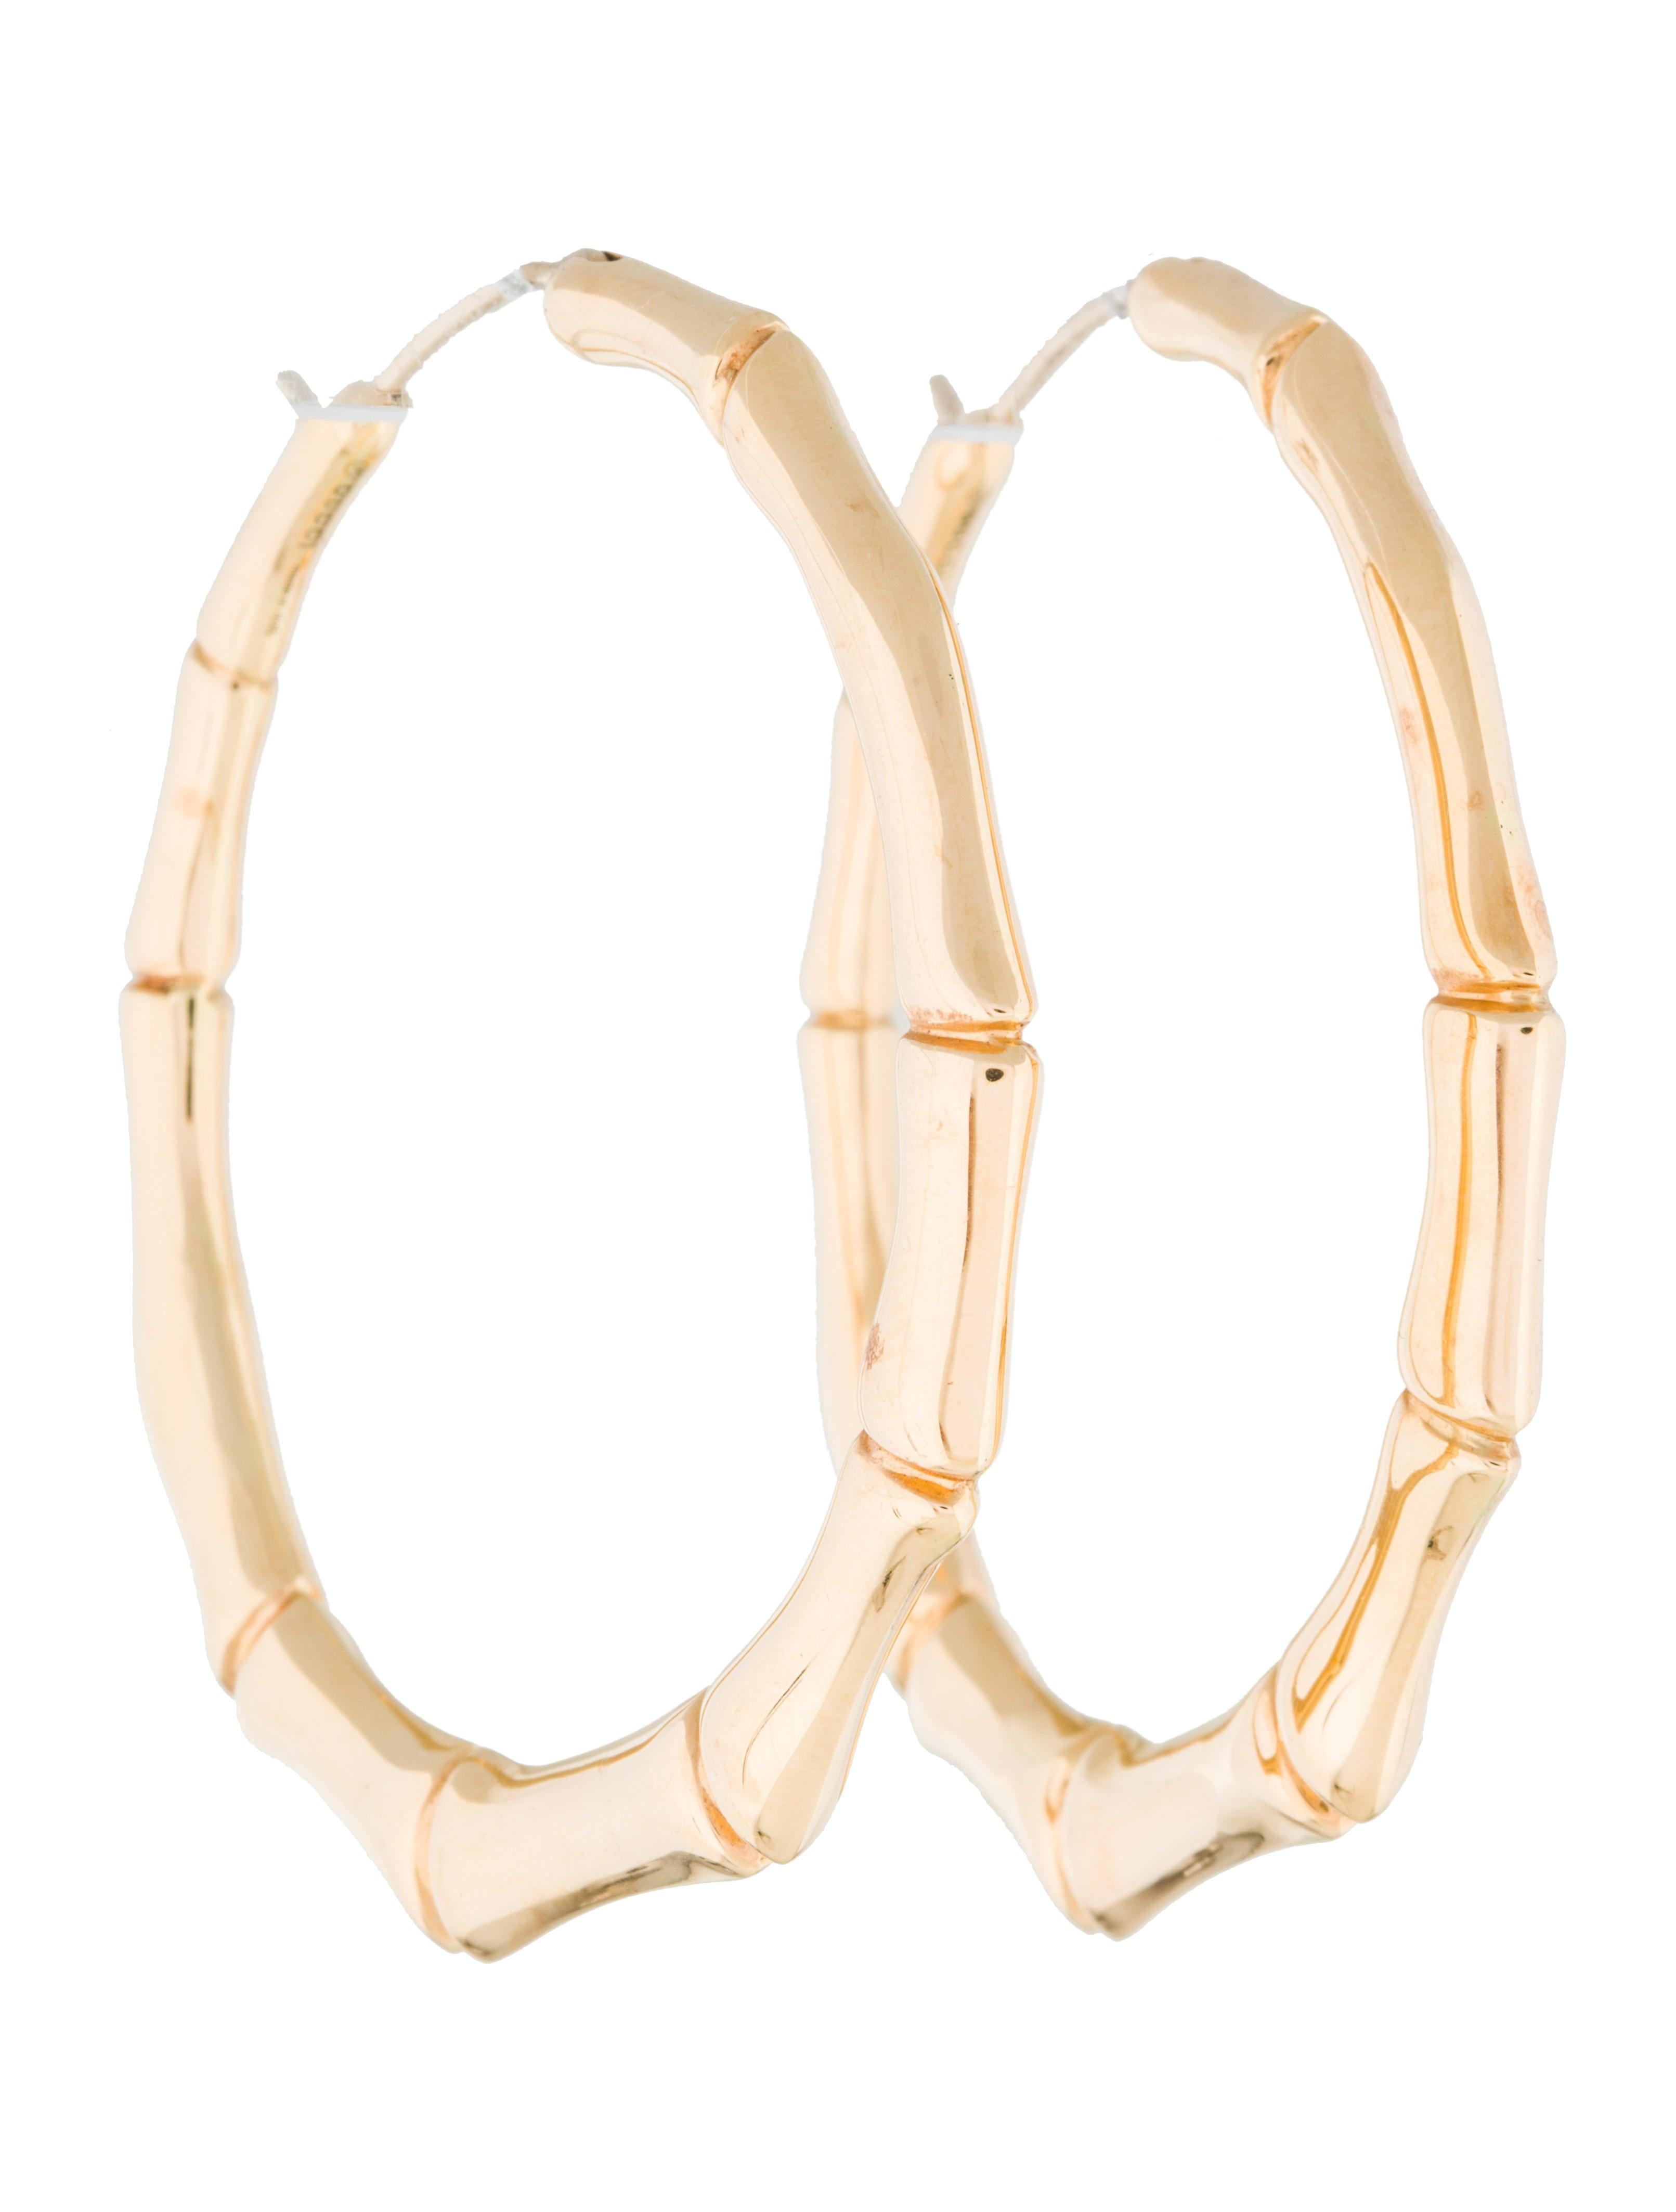 a38e08c06 Gucci 18K Bamboo Hoops - Earrings - GUC150297 | The RealReal